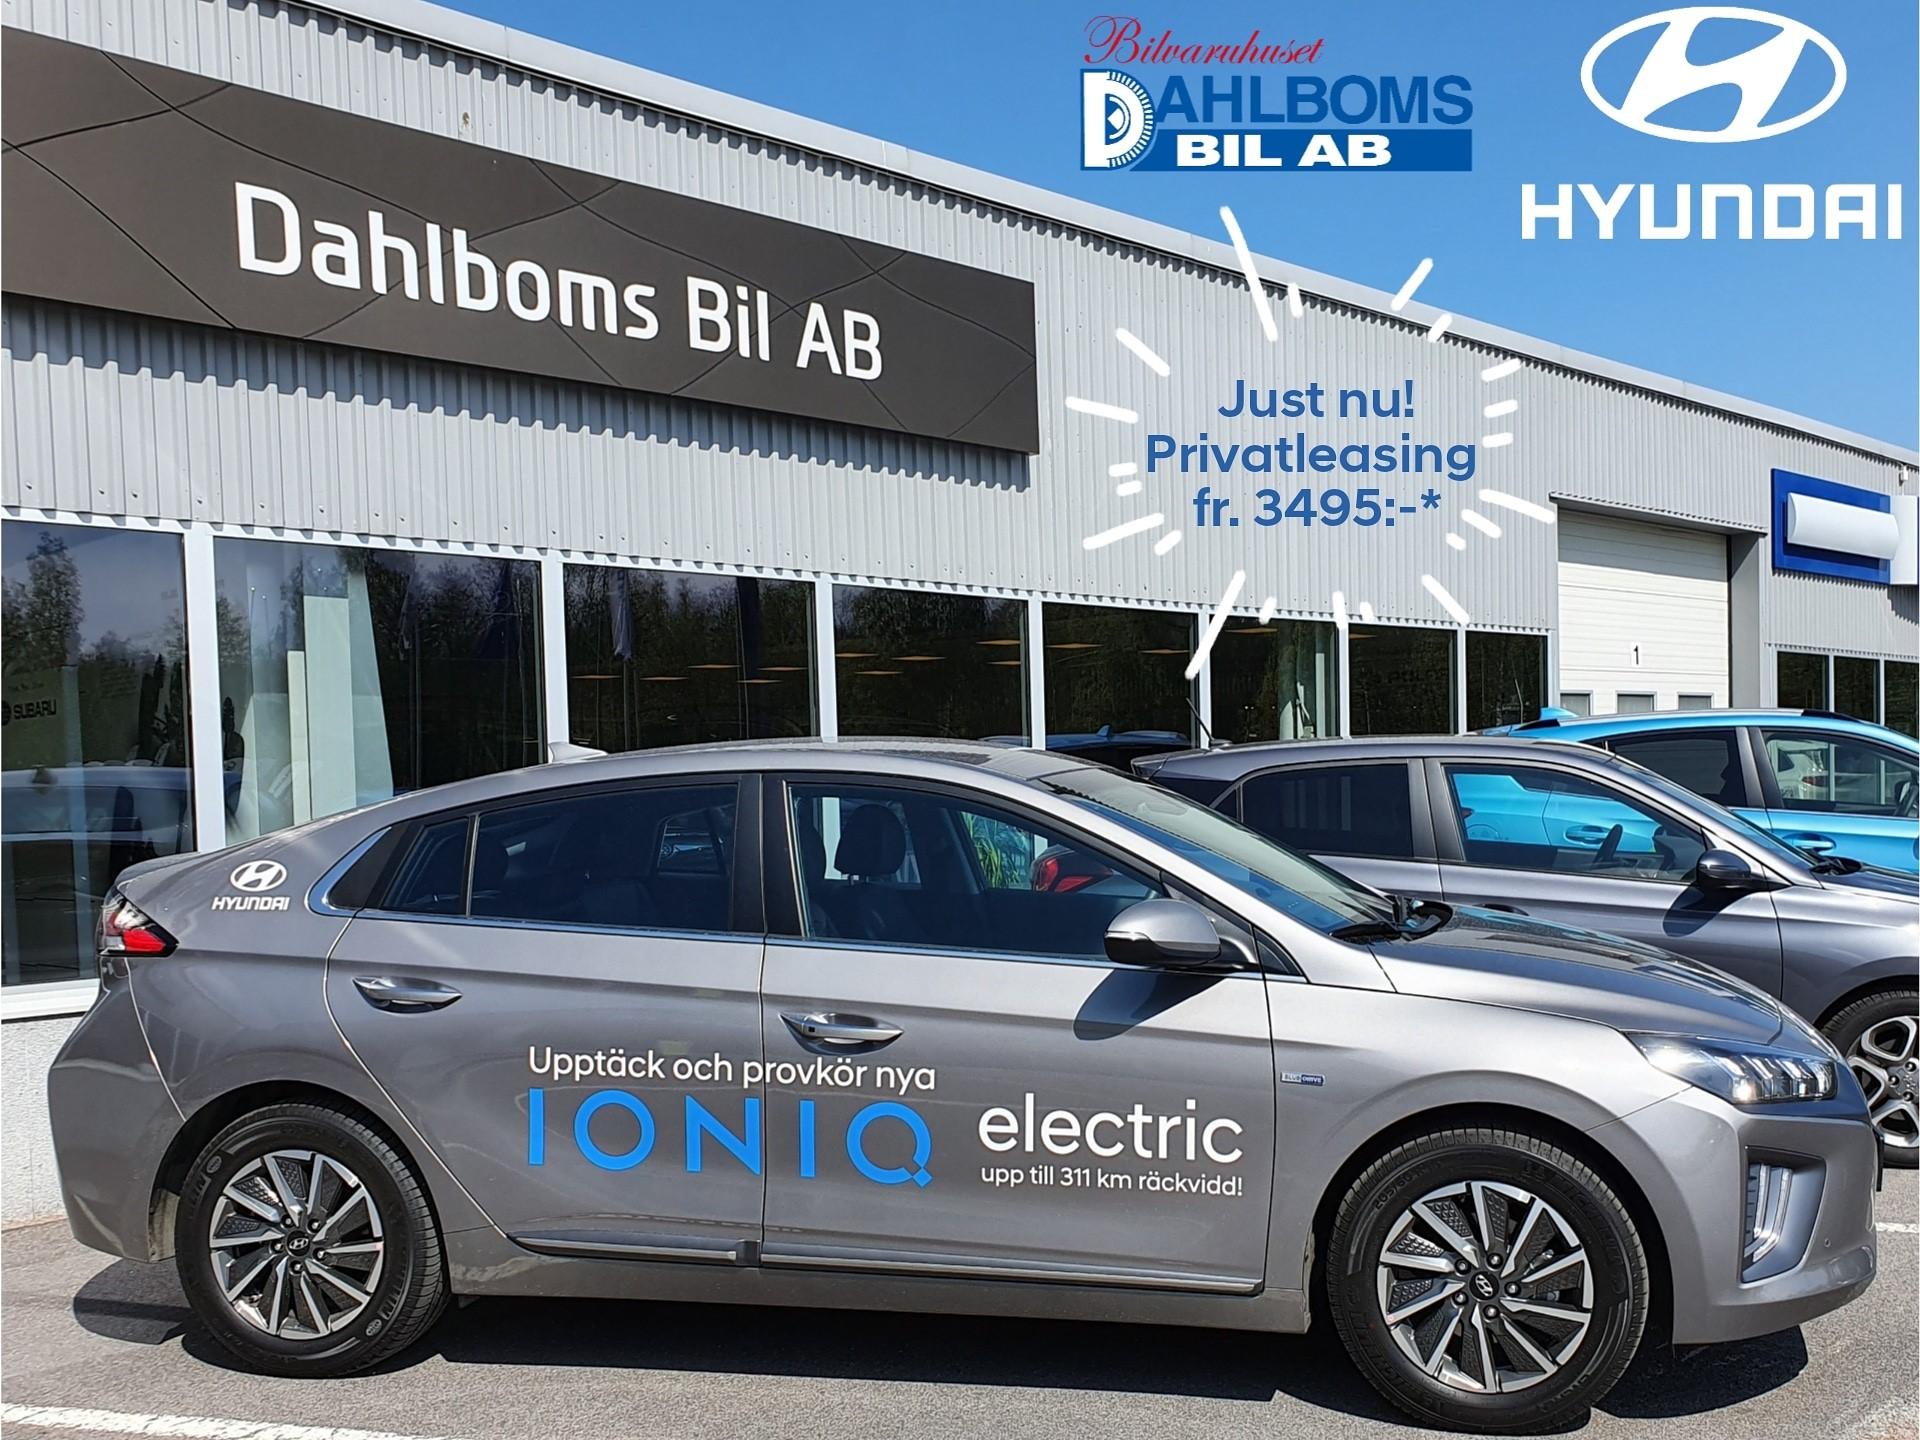 Subaru, Hyundai & Aixam mopedbilar Dahlboms bil i Gävle